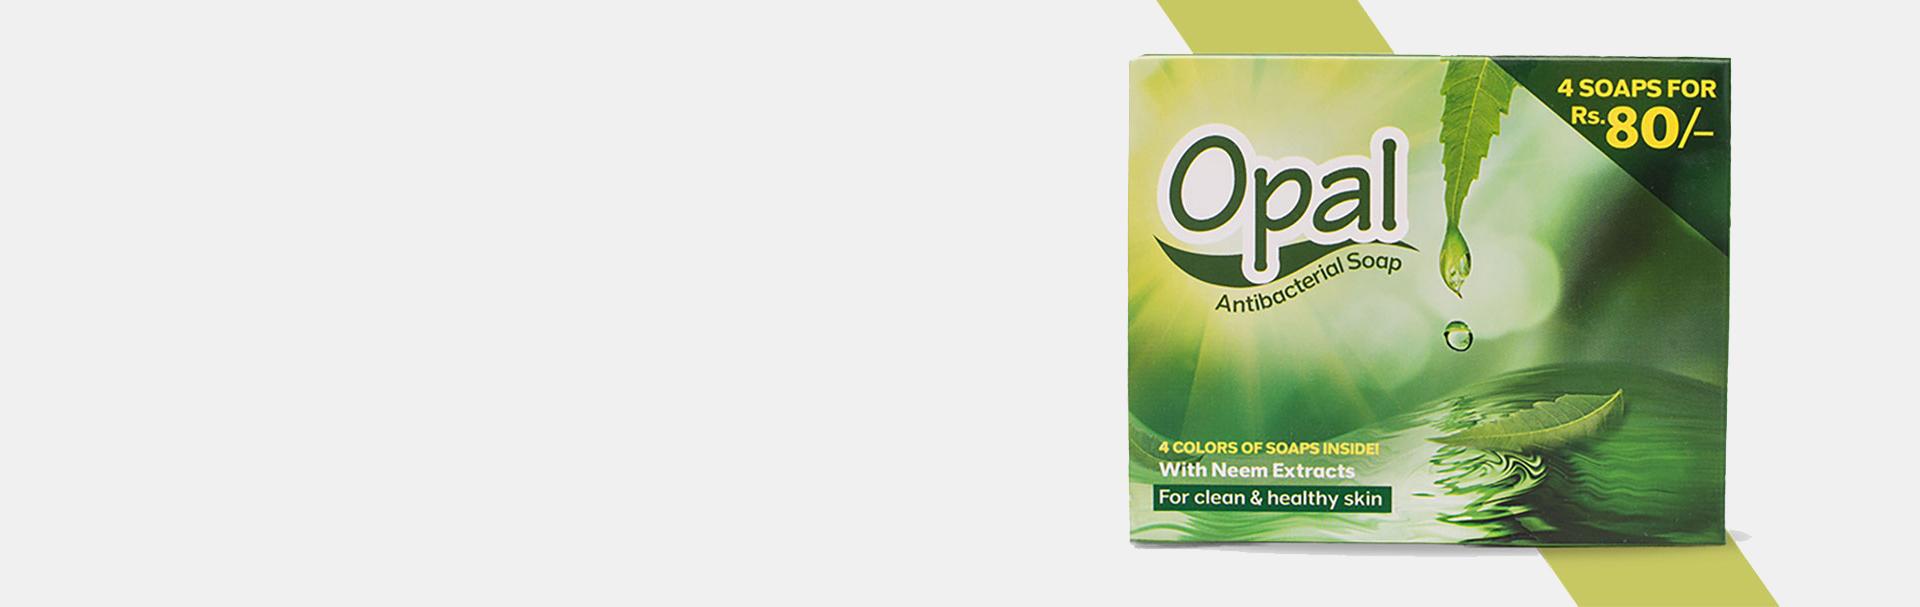 Opal Antibacterial Soap